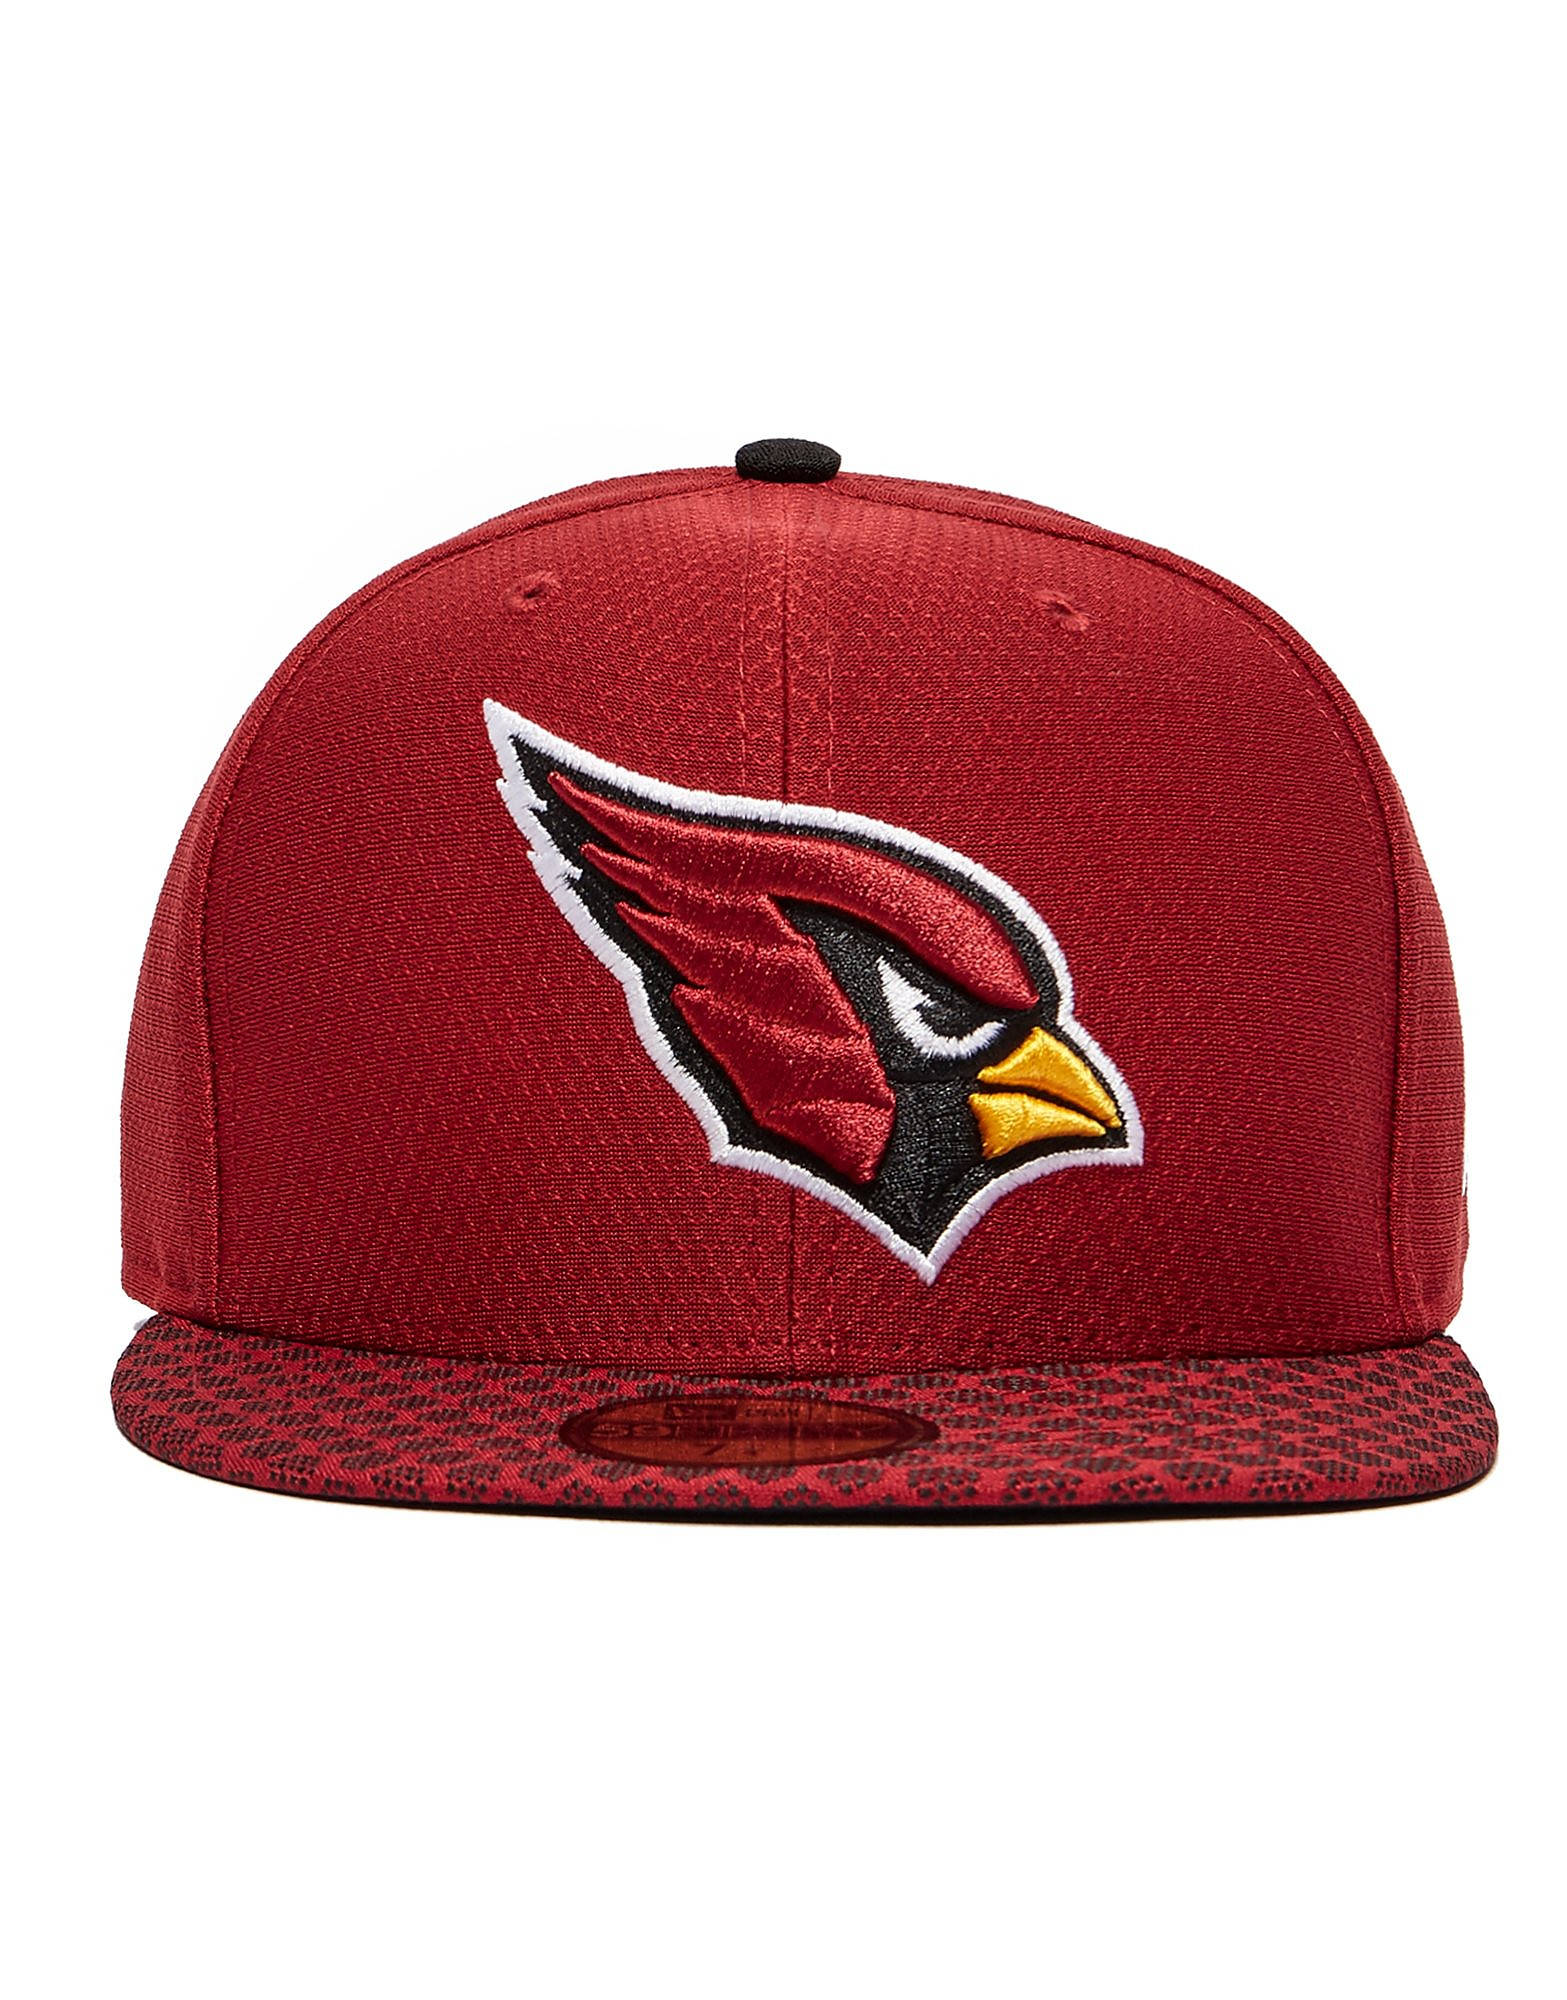 New Era Arizona Cardinals 59FIFTY Cappellino